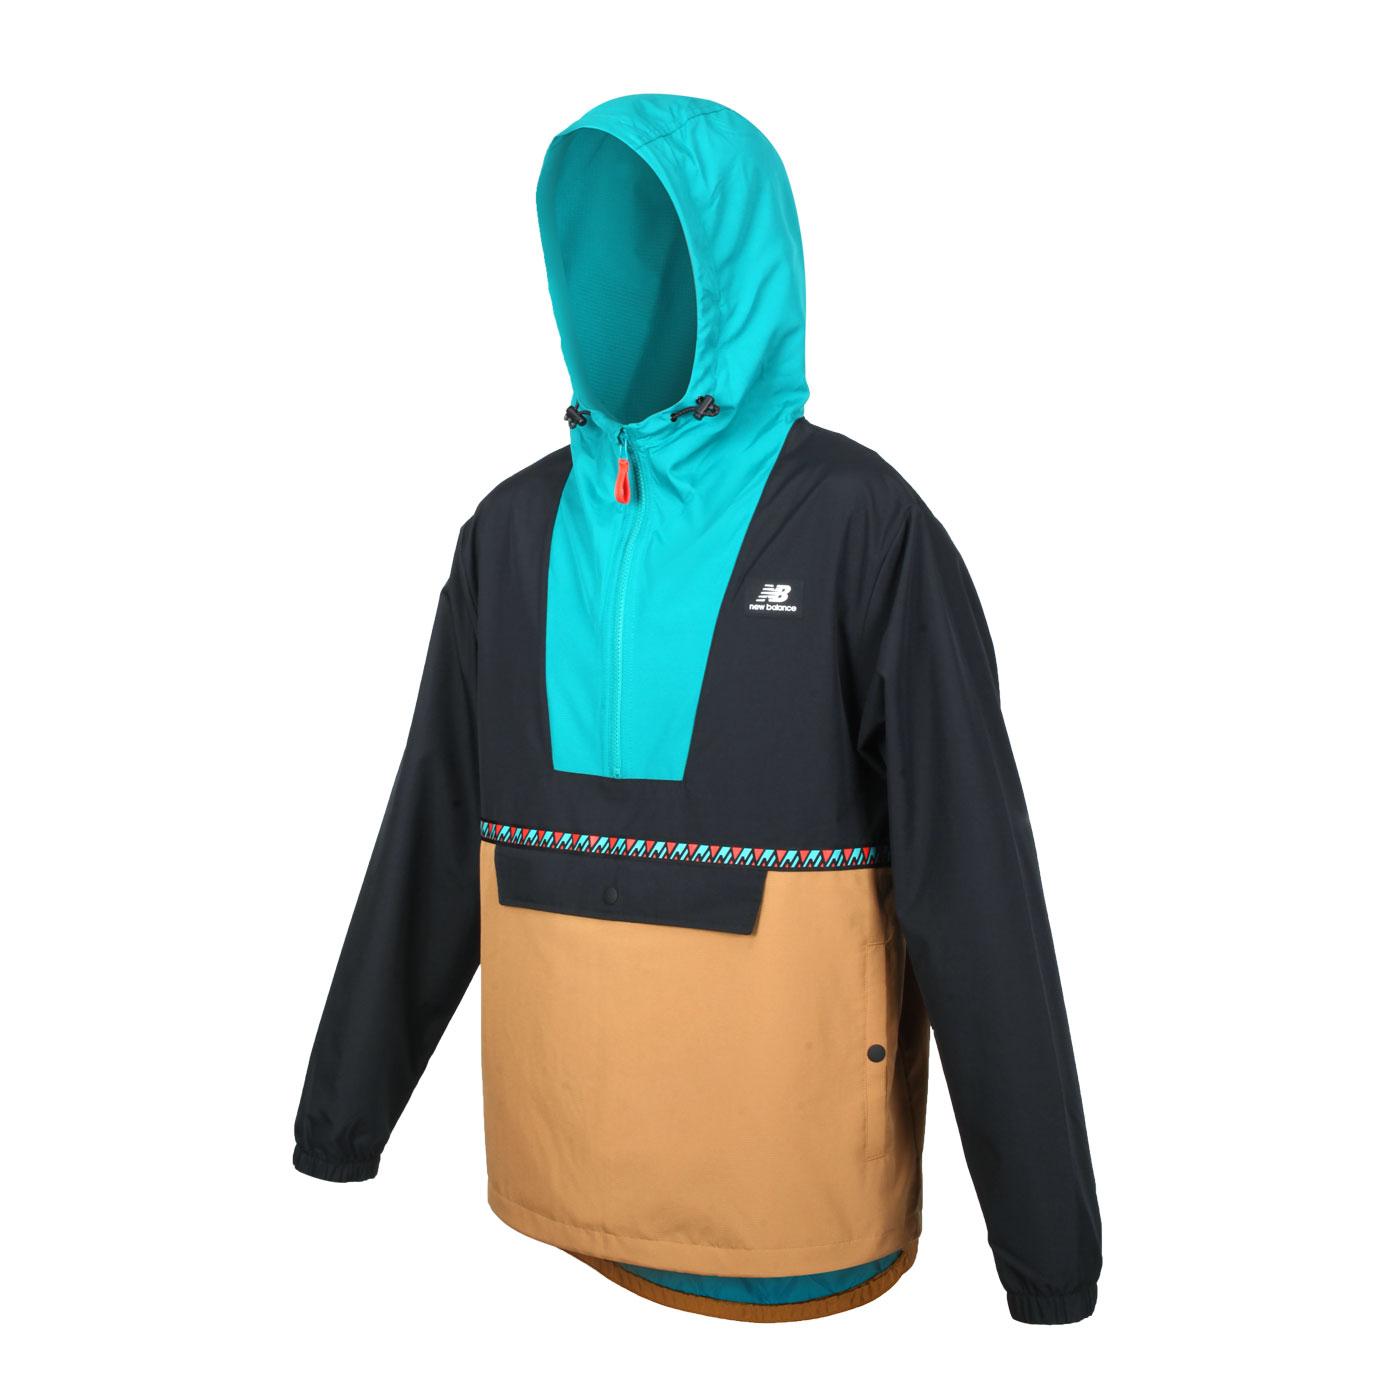 NEW BALANCE 男款拉鍊式長袖連帽防風T恤 MJ03560WWK - 綠黑土黃